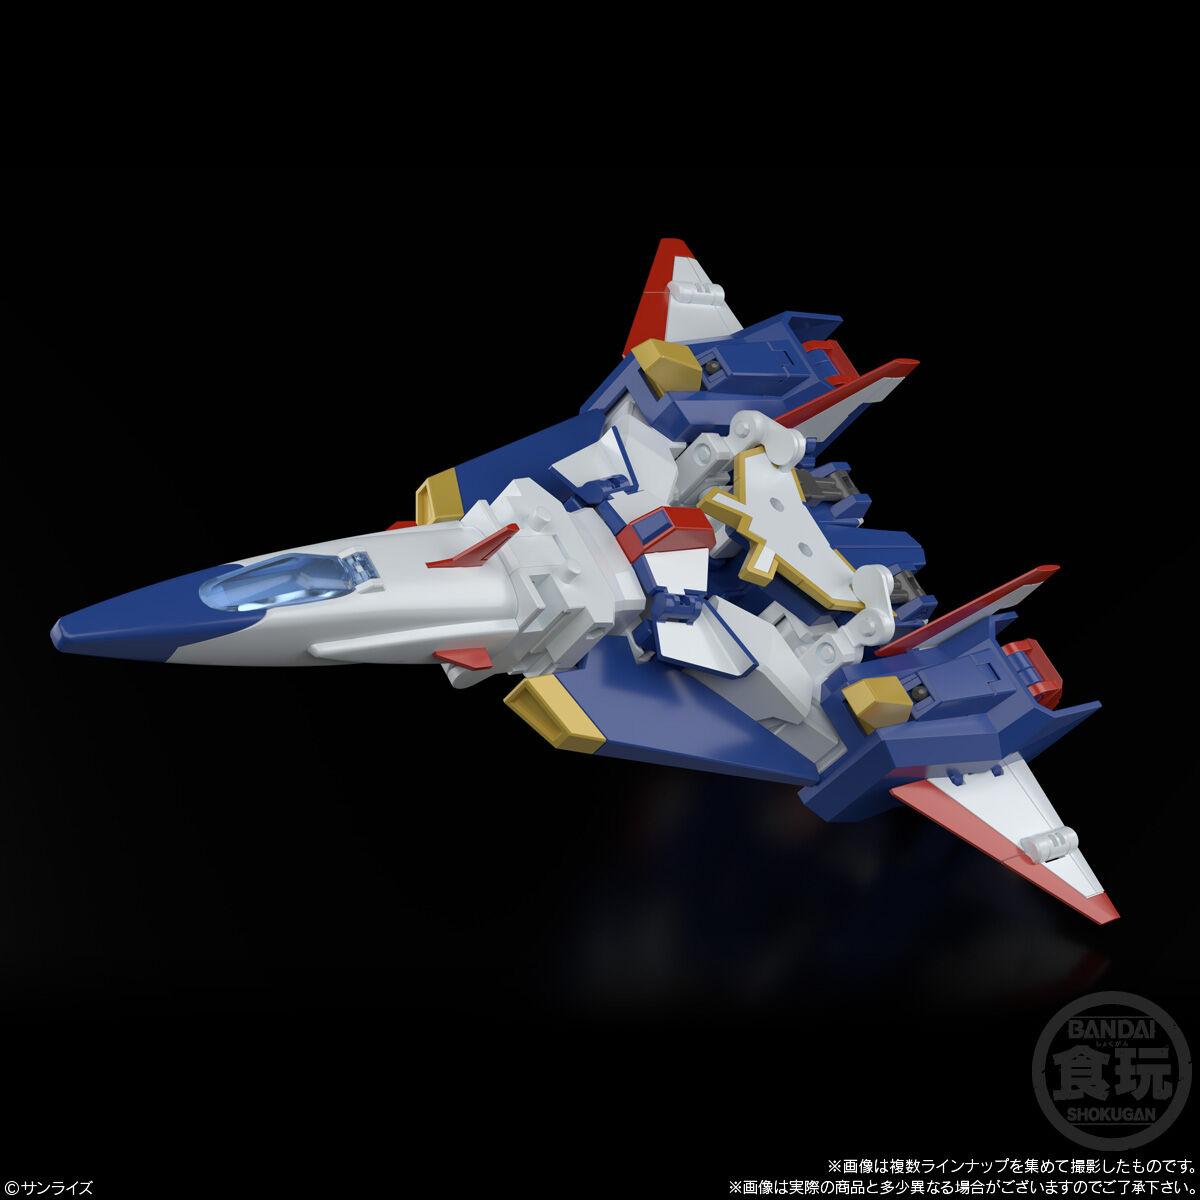 SMP [SHOKUGAN MODELING PROJECT] 太陽の勇者ファイバード_1